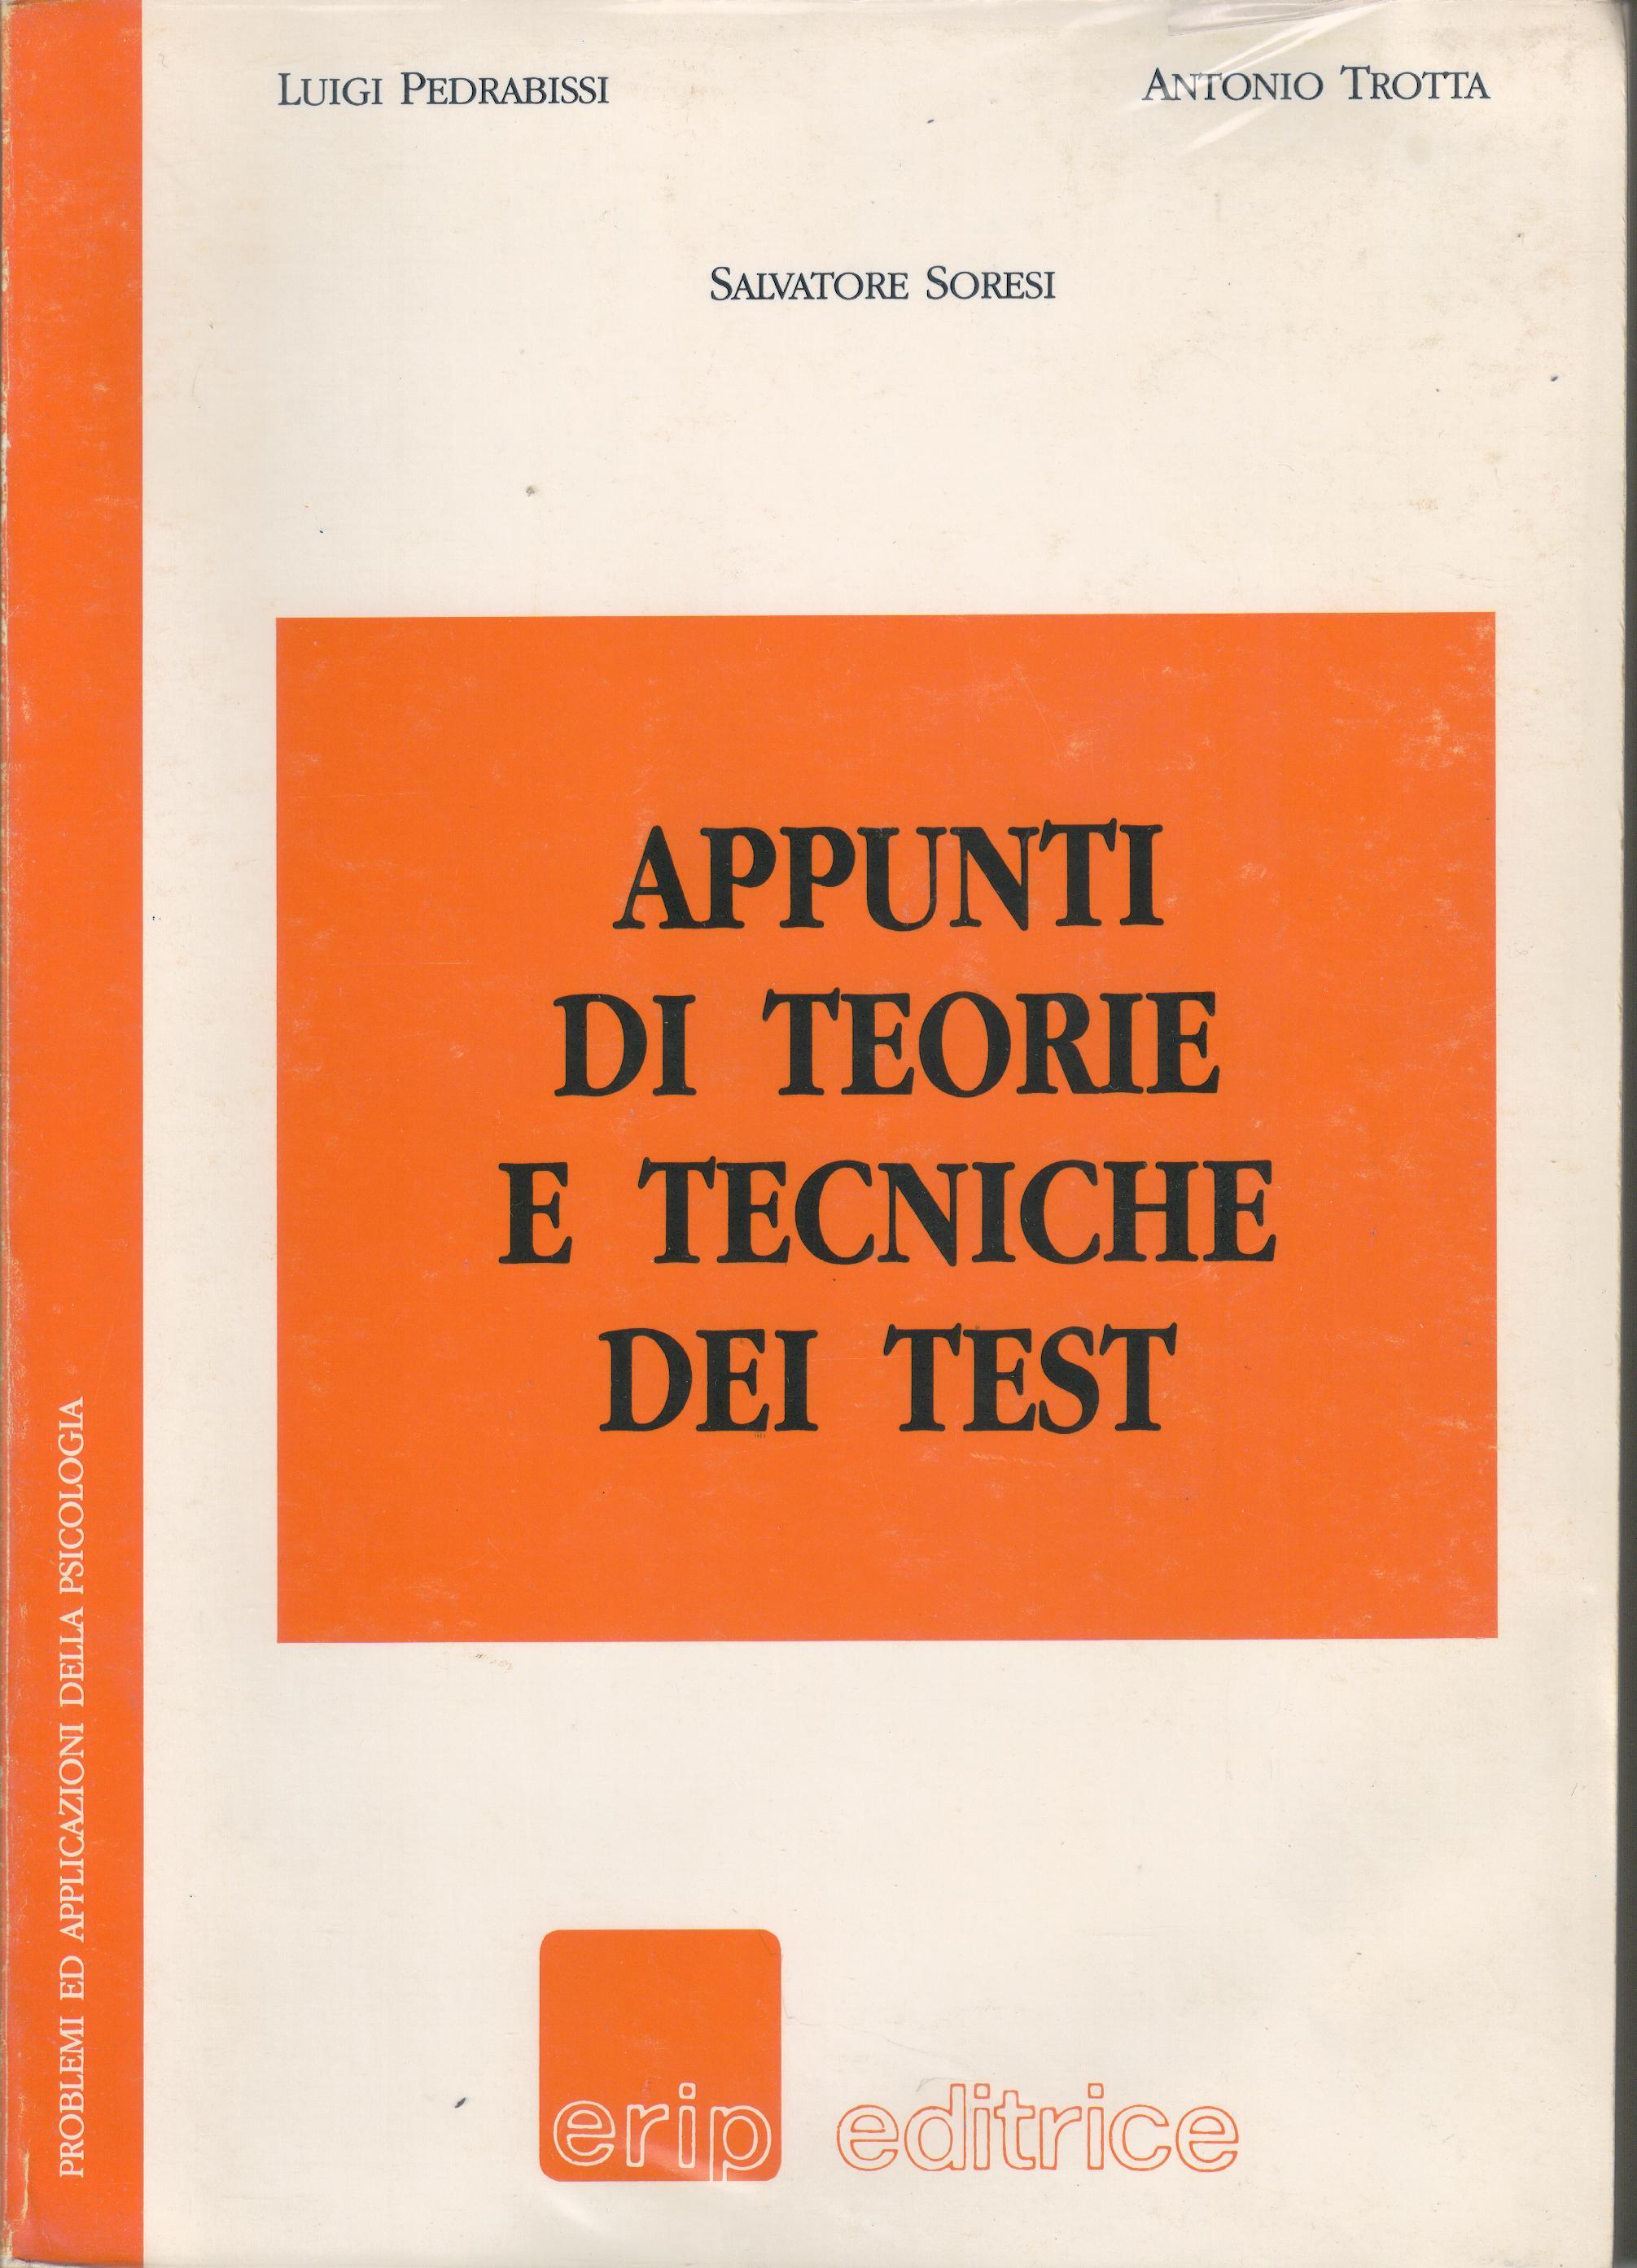 Appunti di teorie di tecniche dei test